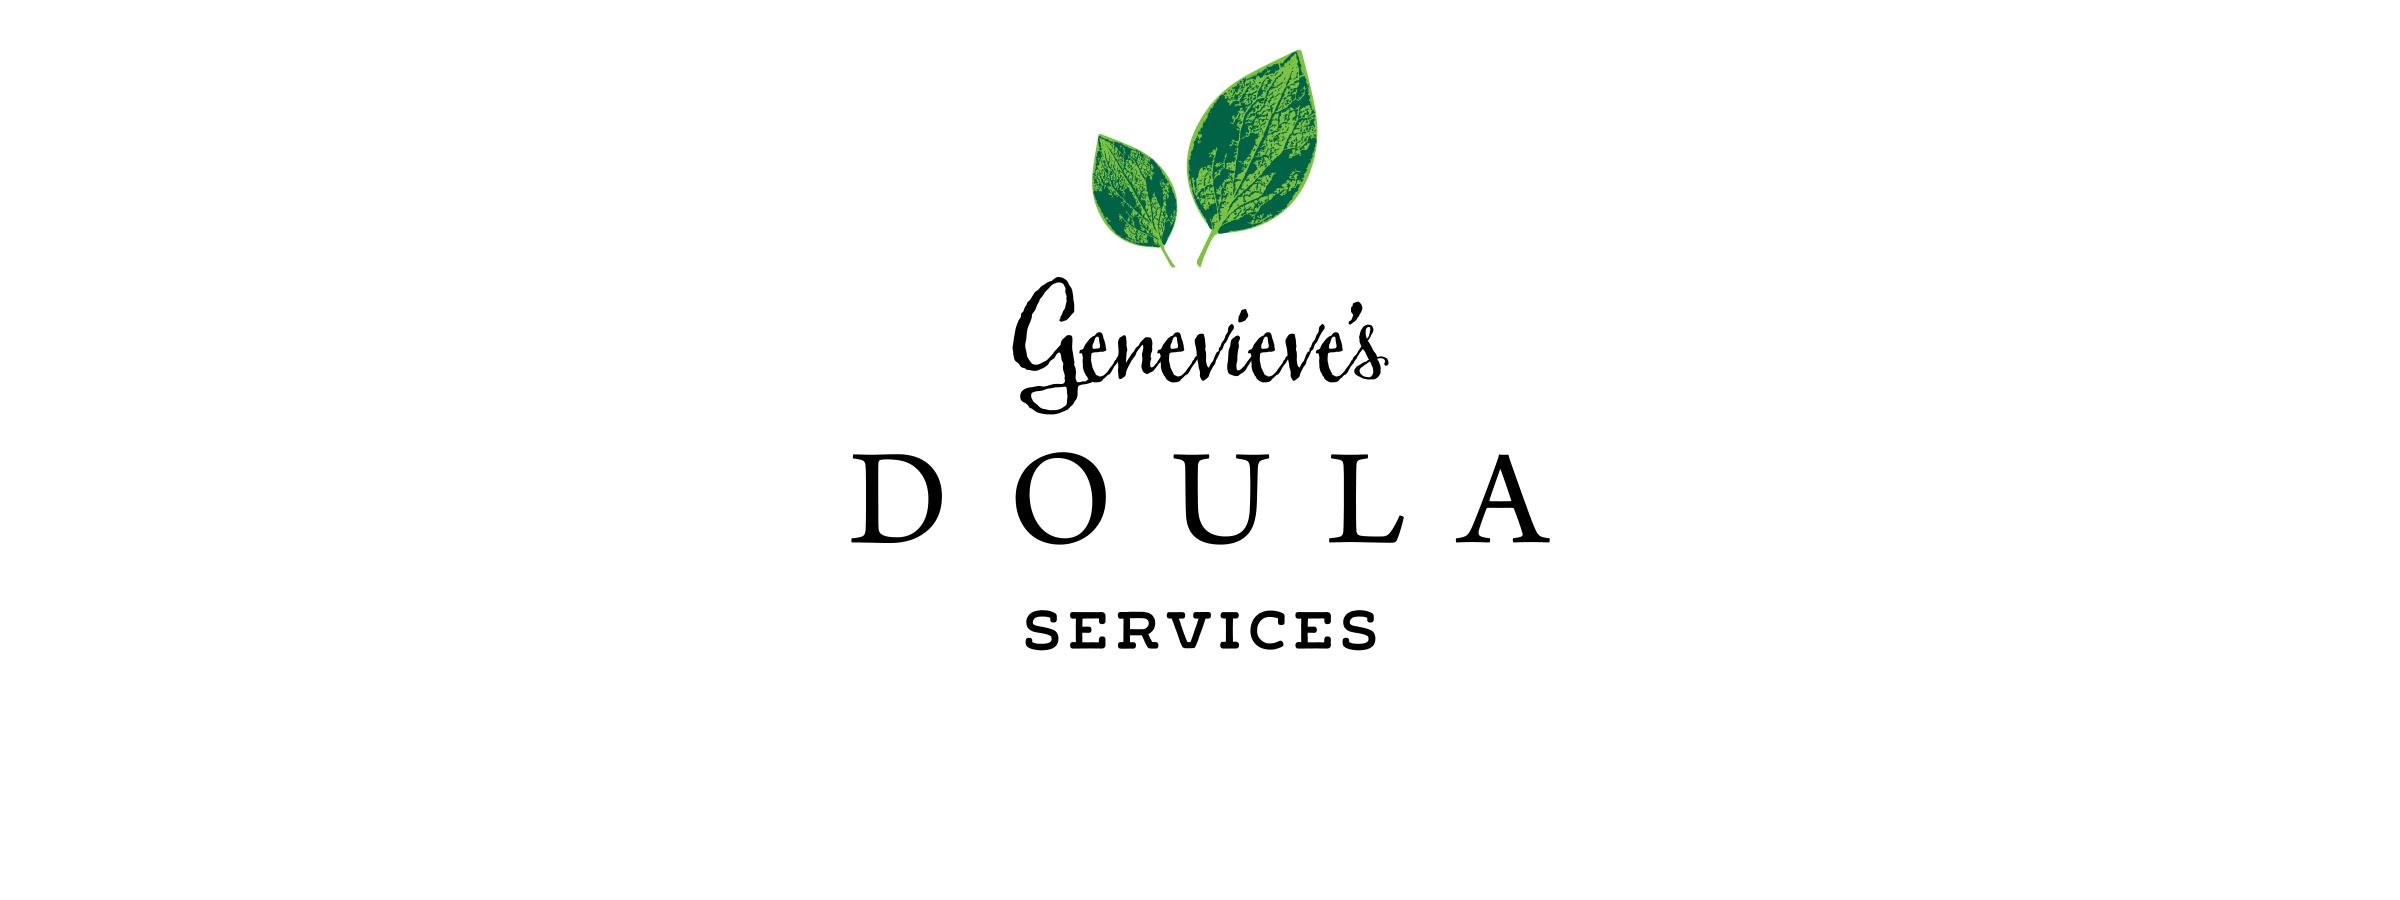 Doula logo.jpg